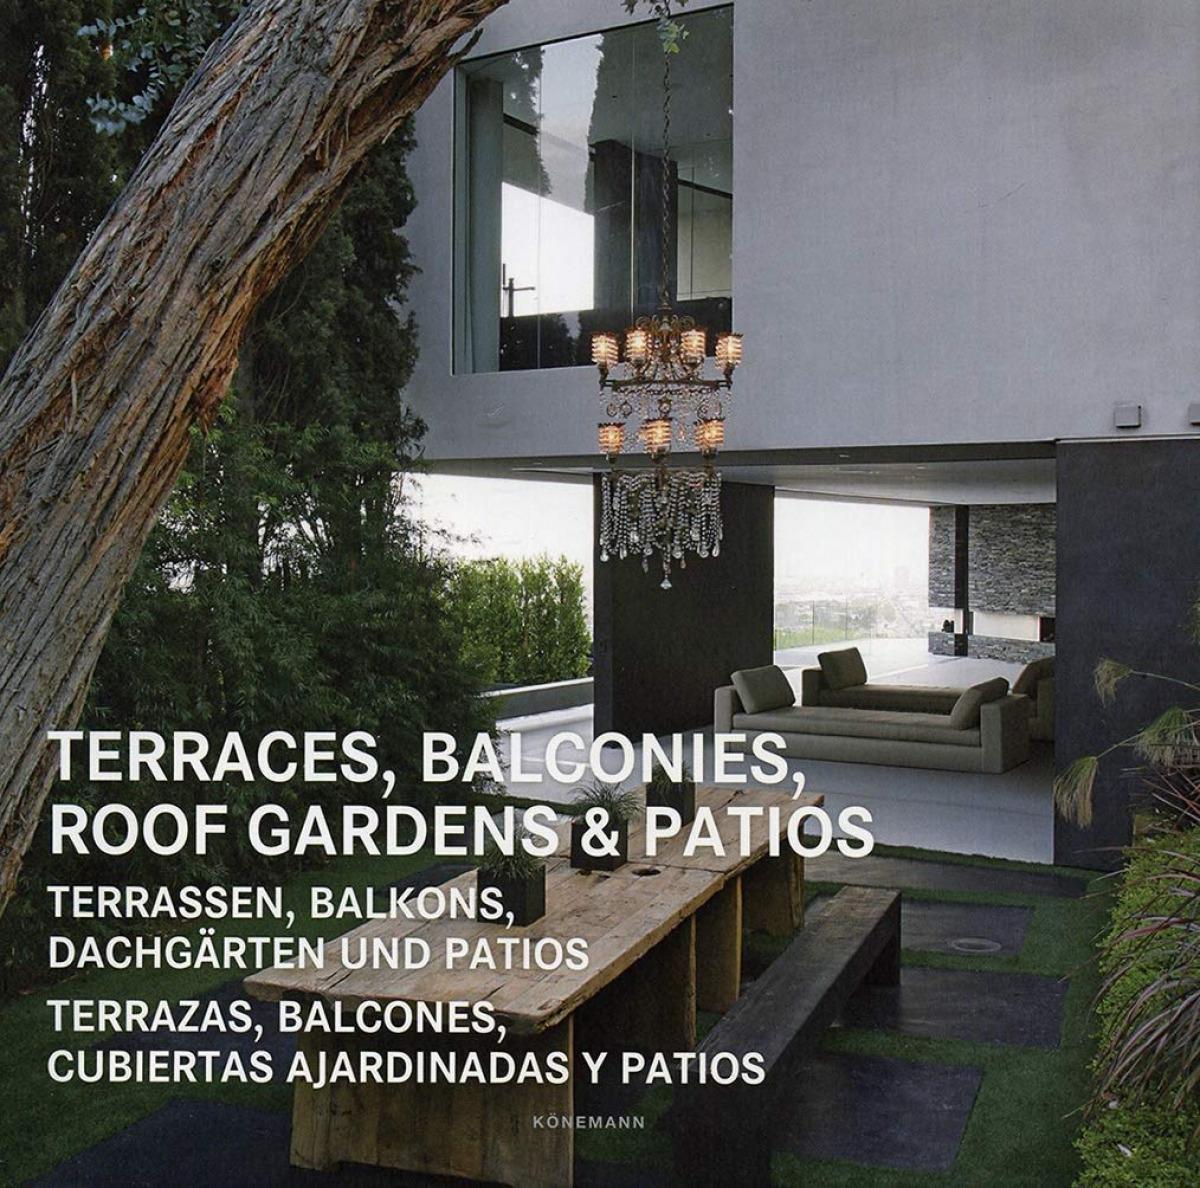 TERRACES, BALCONIES, ROOF GARDENS &PATIOS 9783741920455